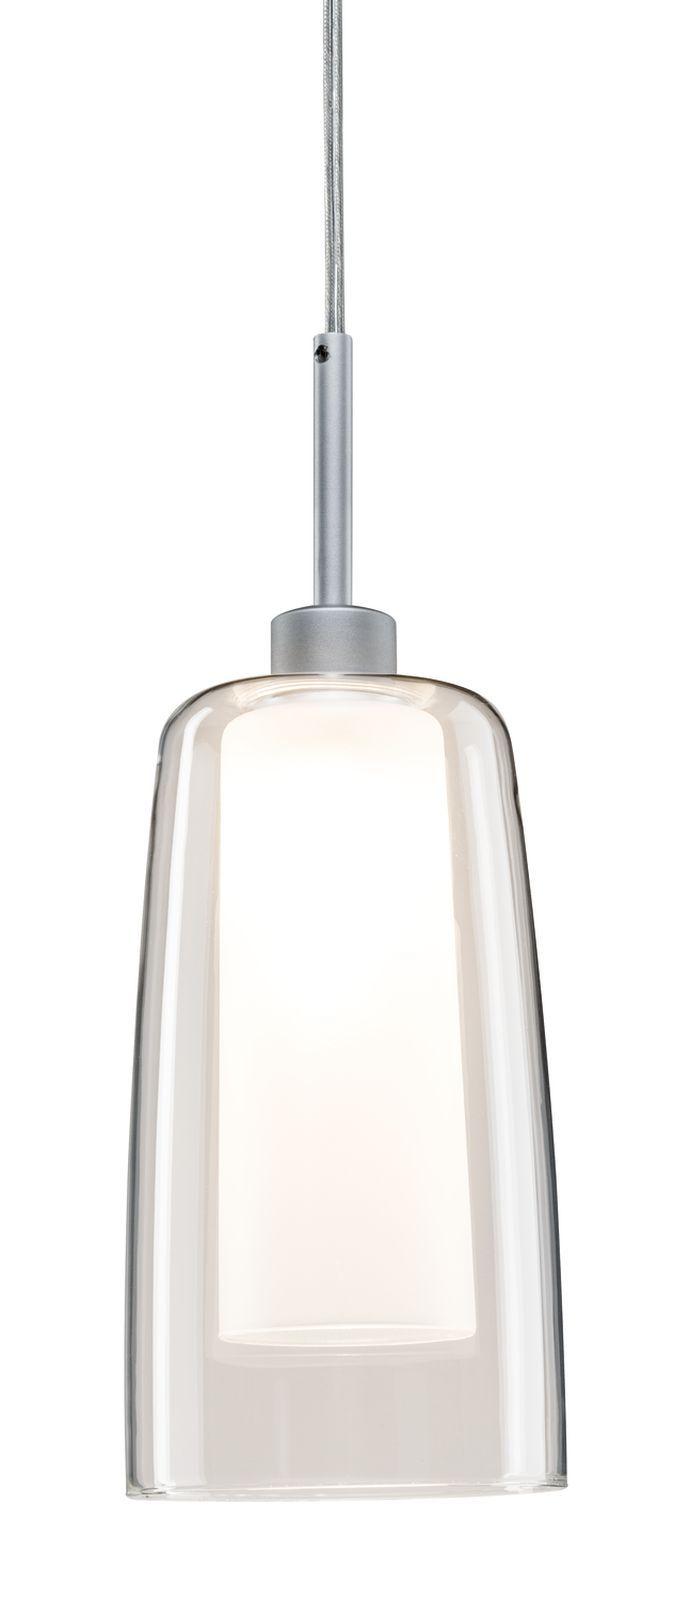 Paulmann URail LED Pendulum Arido 3W Chrom matt mit klarem und satiniertem Glas